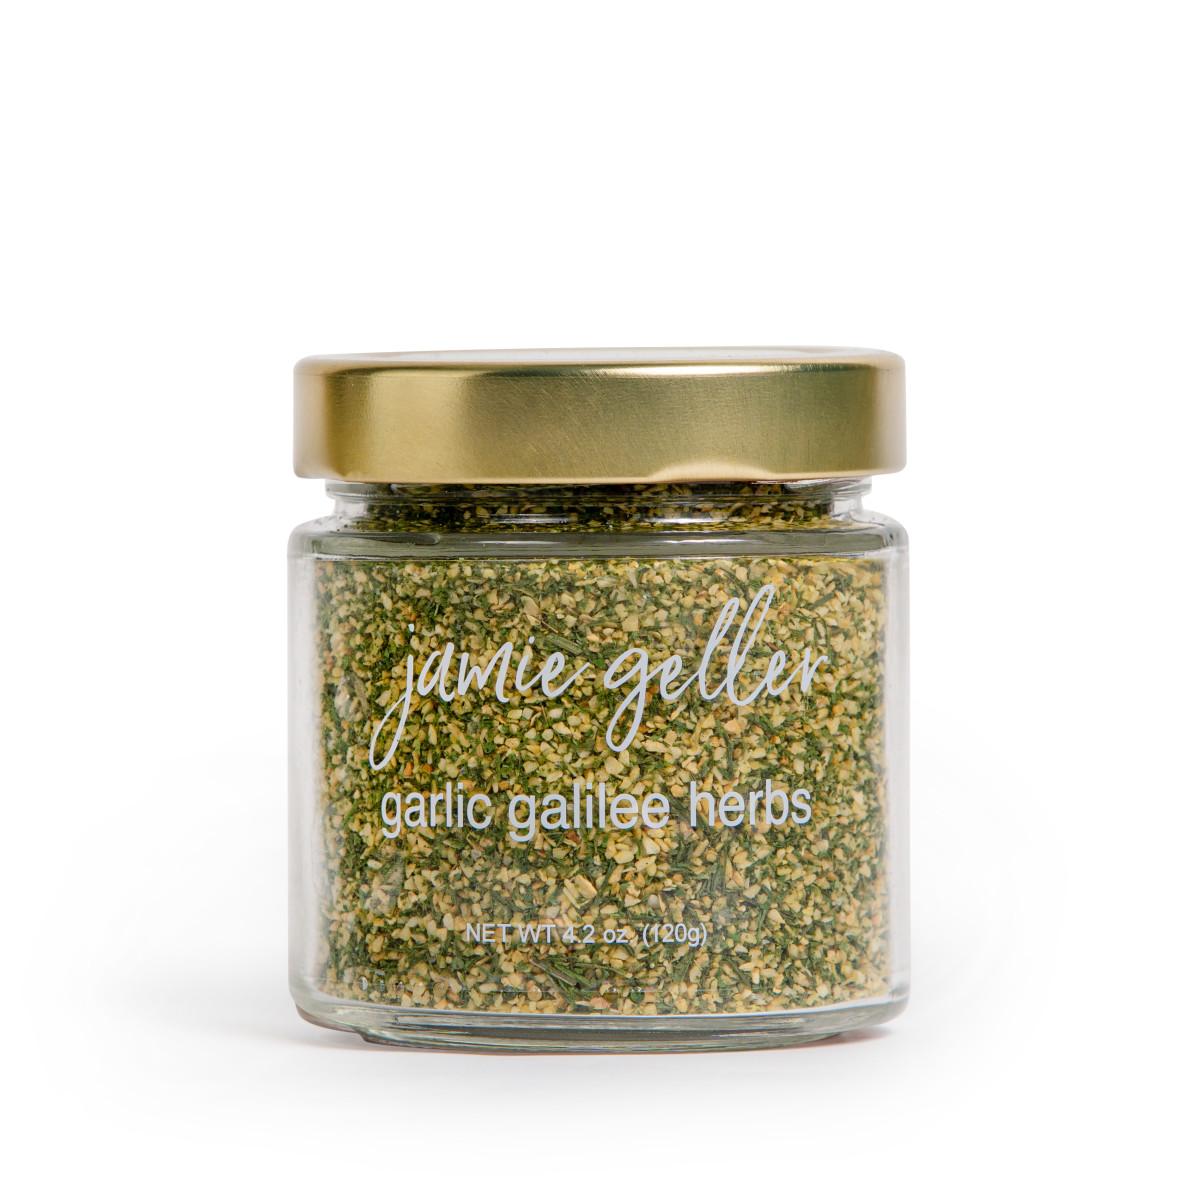 Garlic Galilee Herbs